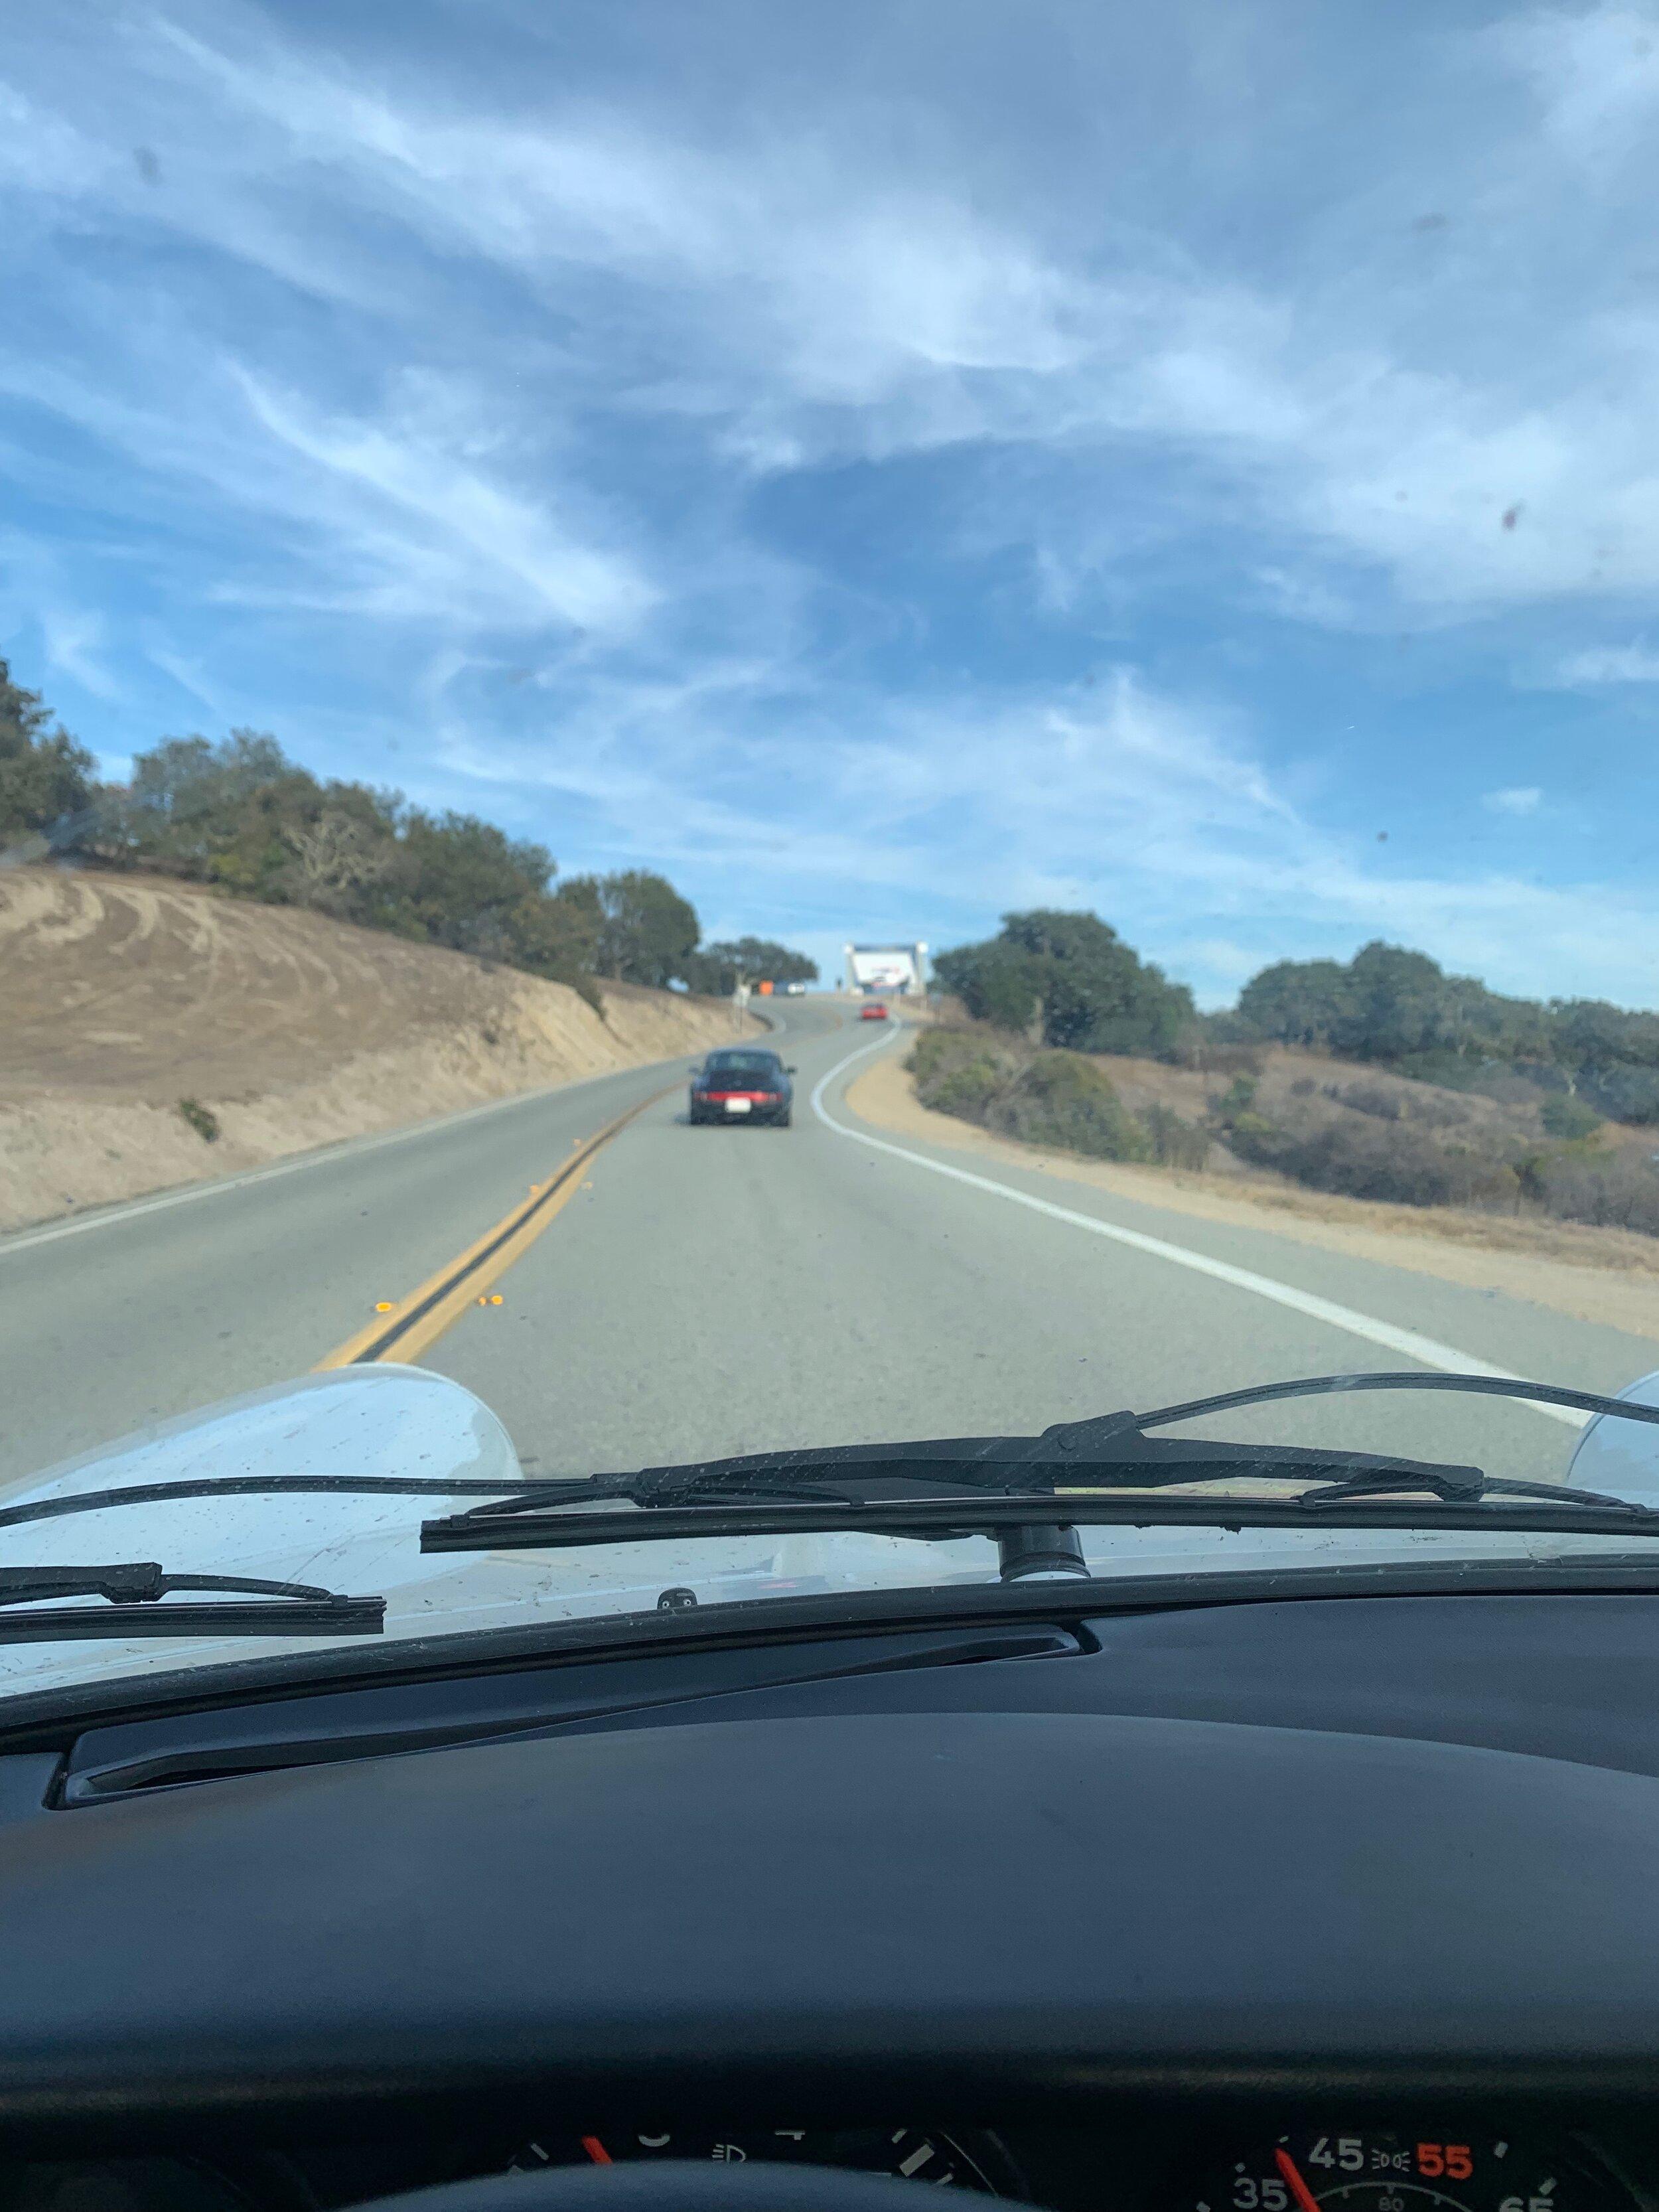 The road to Laguna Seca